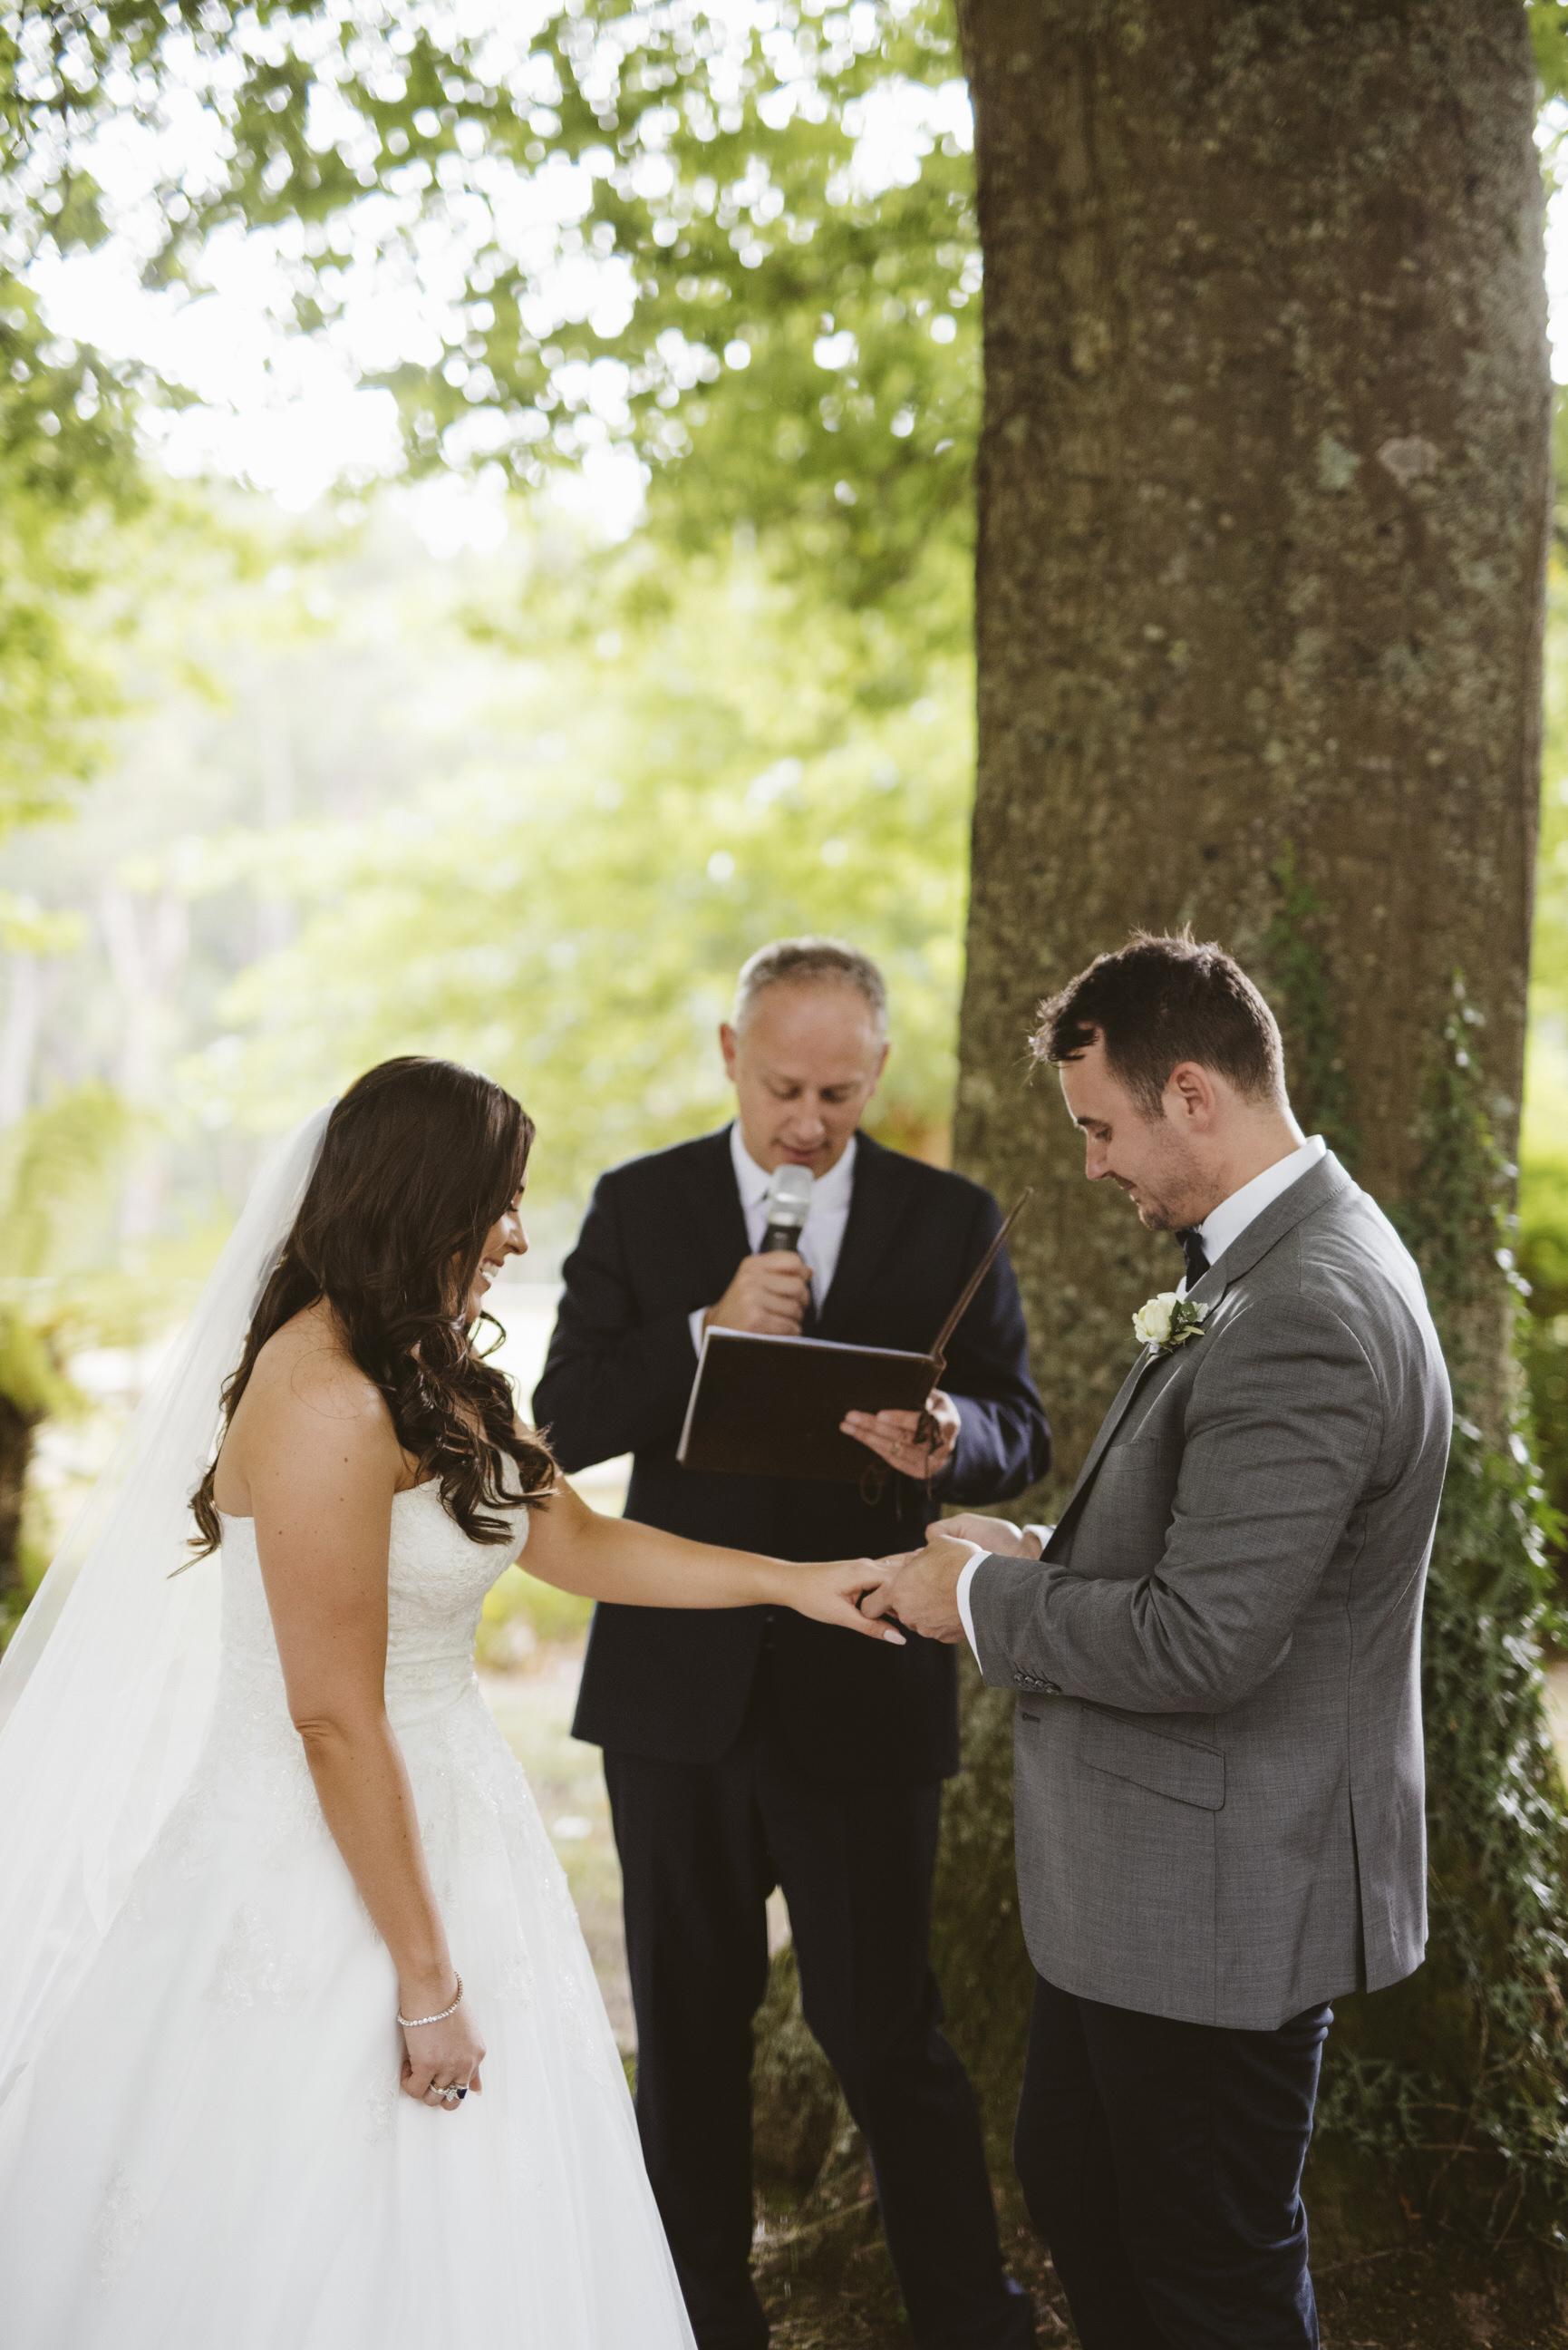 Motta Weddings - Amy and Shane-203.jpg